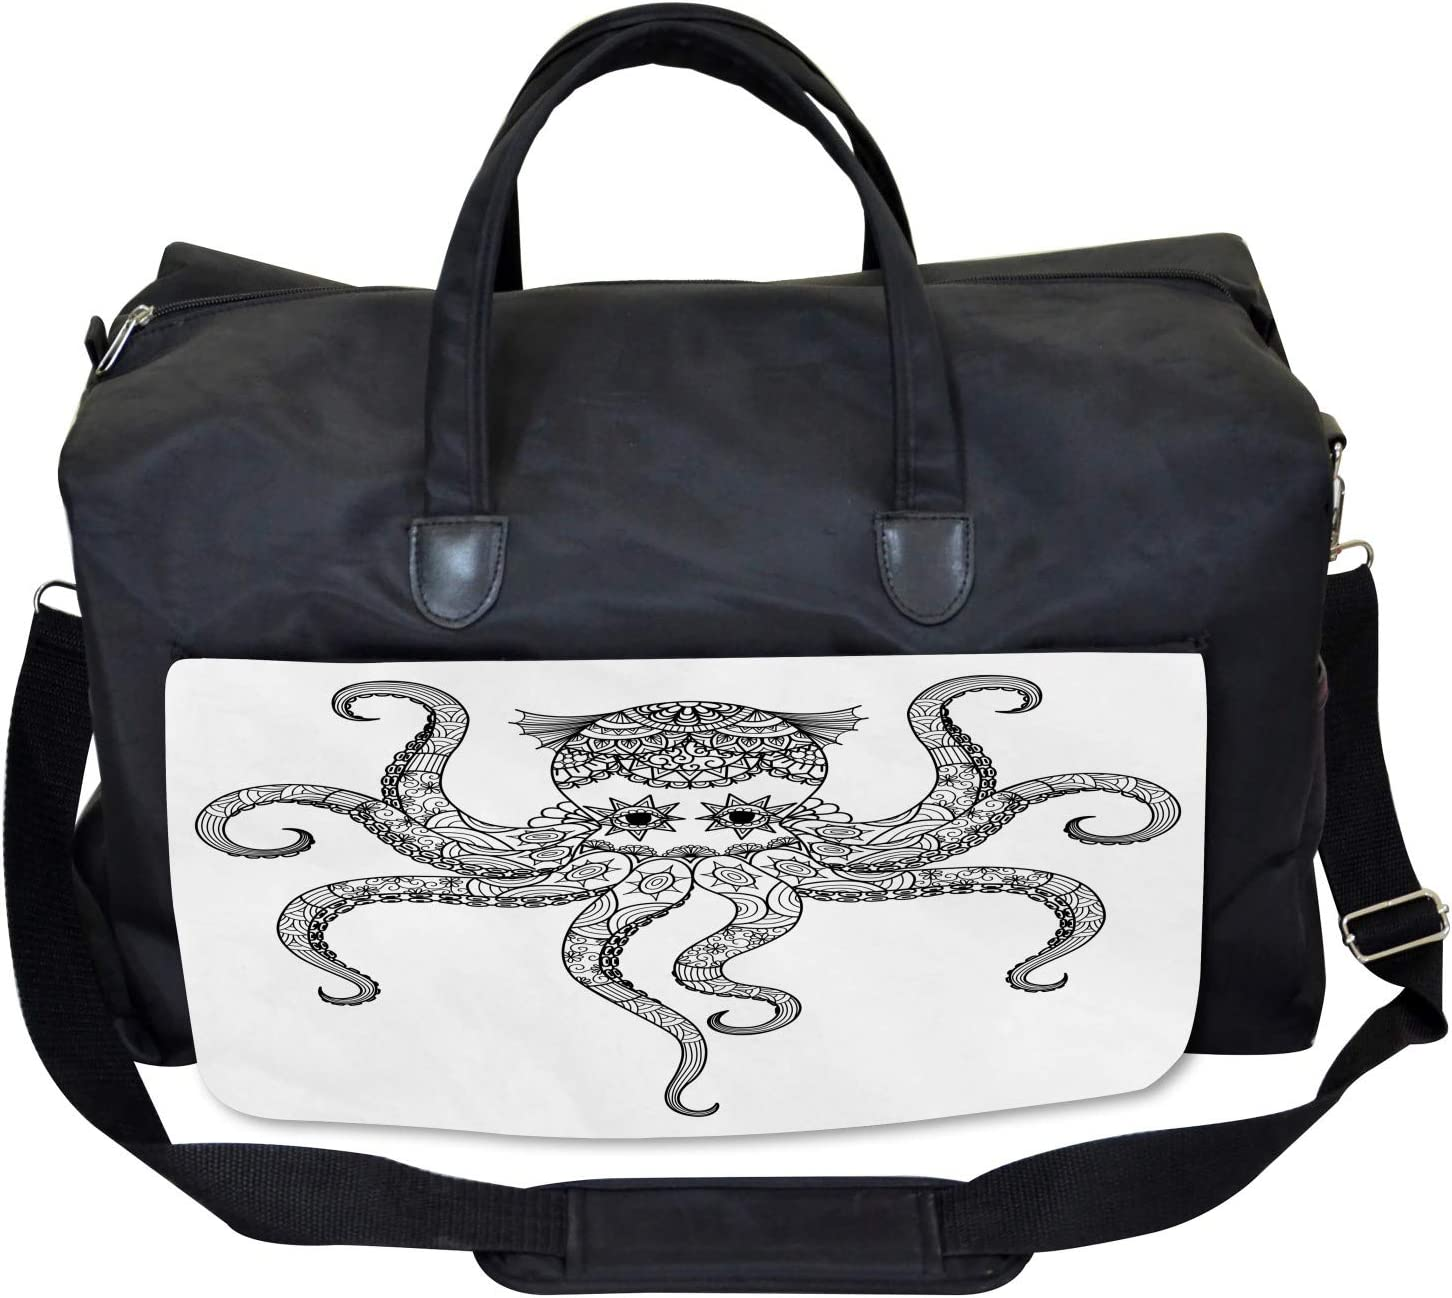 Mandala Tribal Ethnic Large Weekender Carry-on Ambesonne Octopus Gym Bag